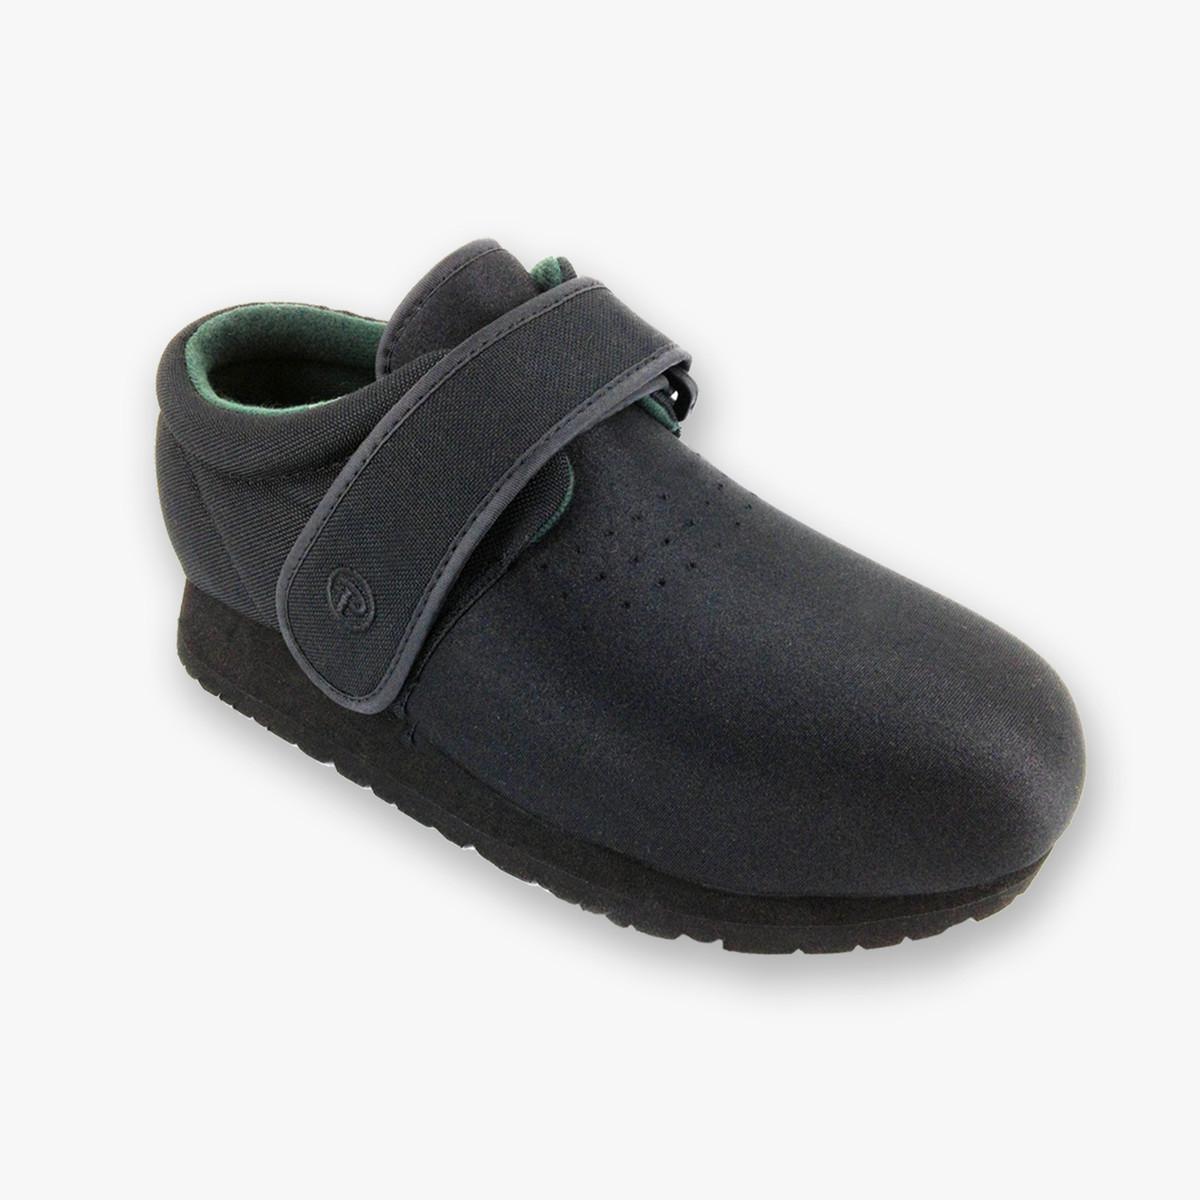 Pedors Classic Black Stretch Diabetic Orthopedic Shoes